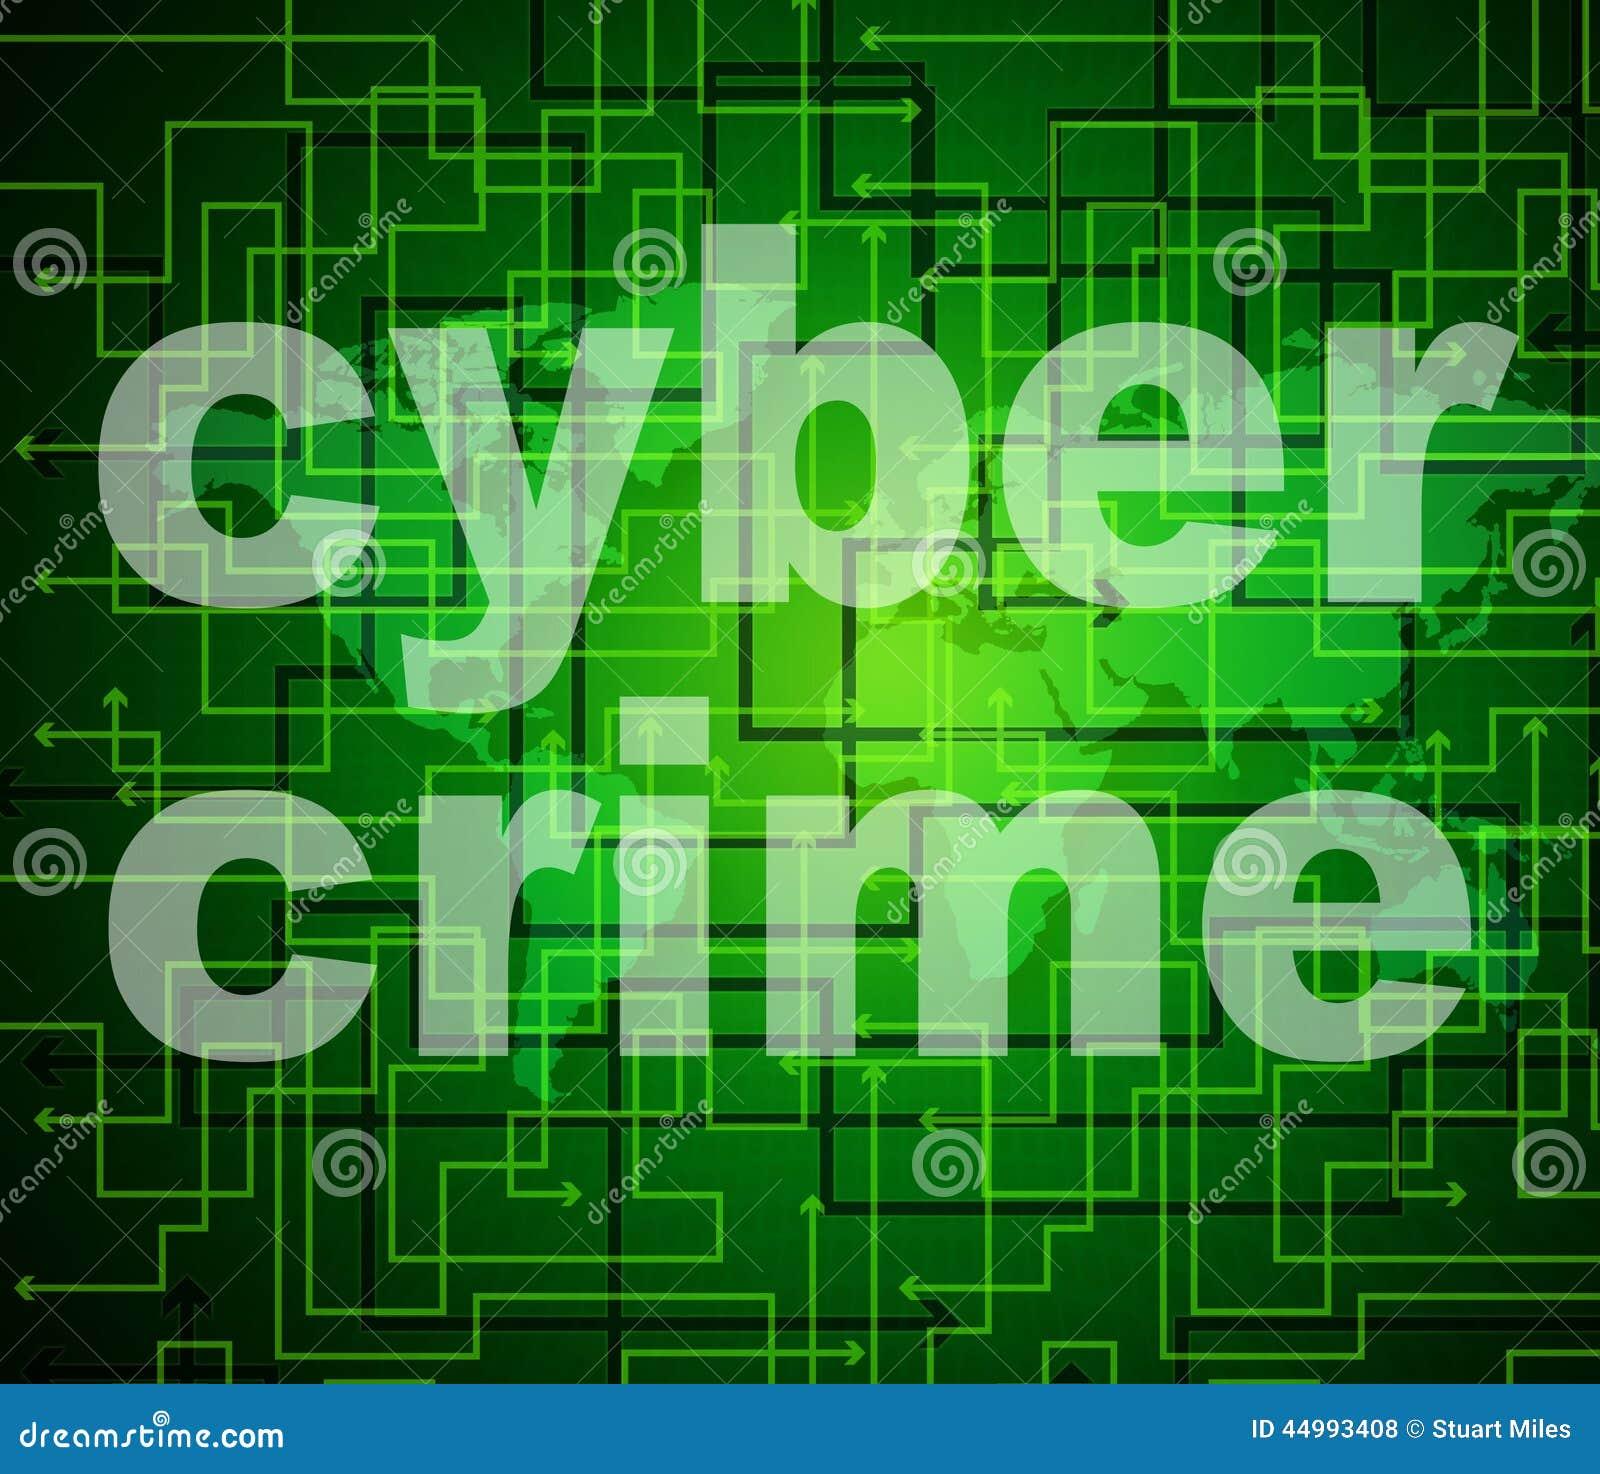 Cyber-Verbrechen bedeutet World Wide Web und Verbrecher